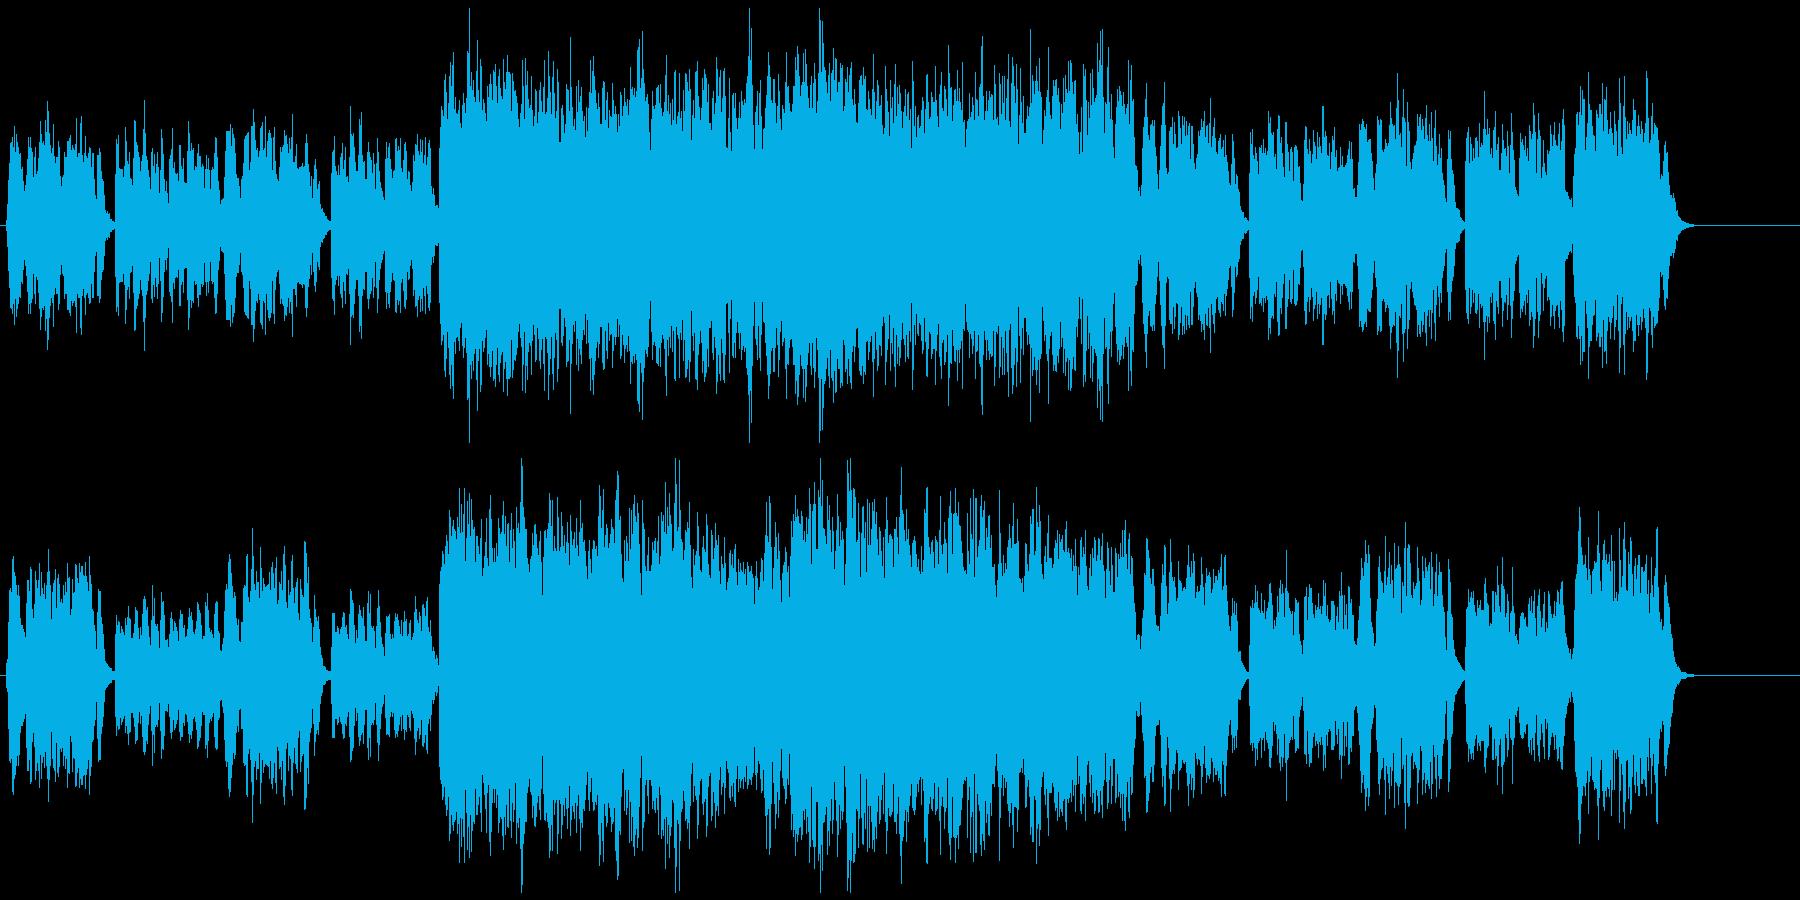 RPGの宮殿を思わせるクラシックの再生済みの波形